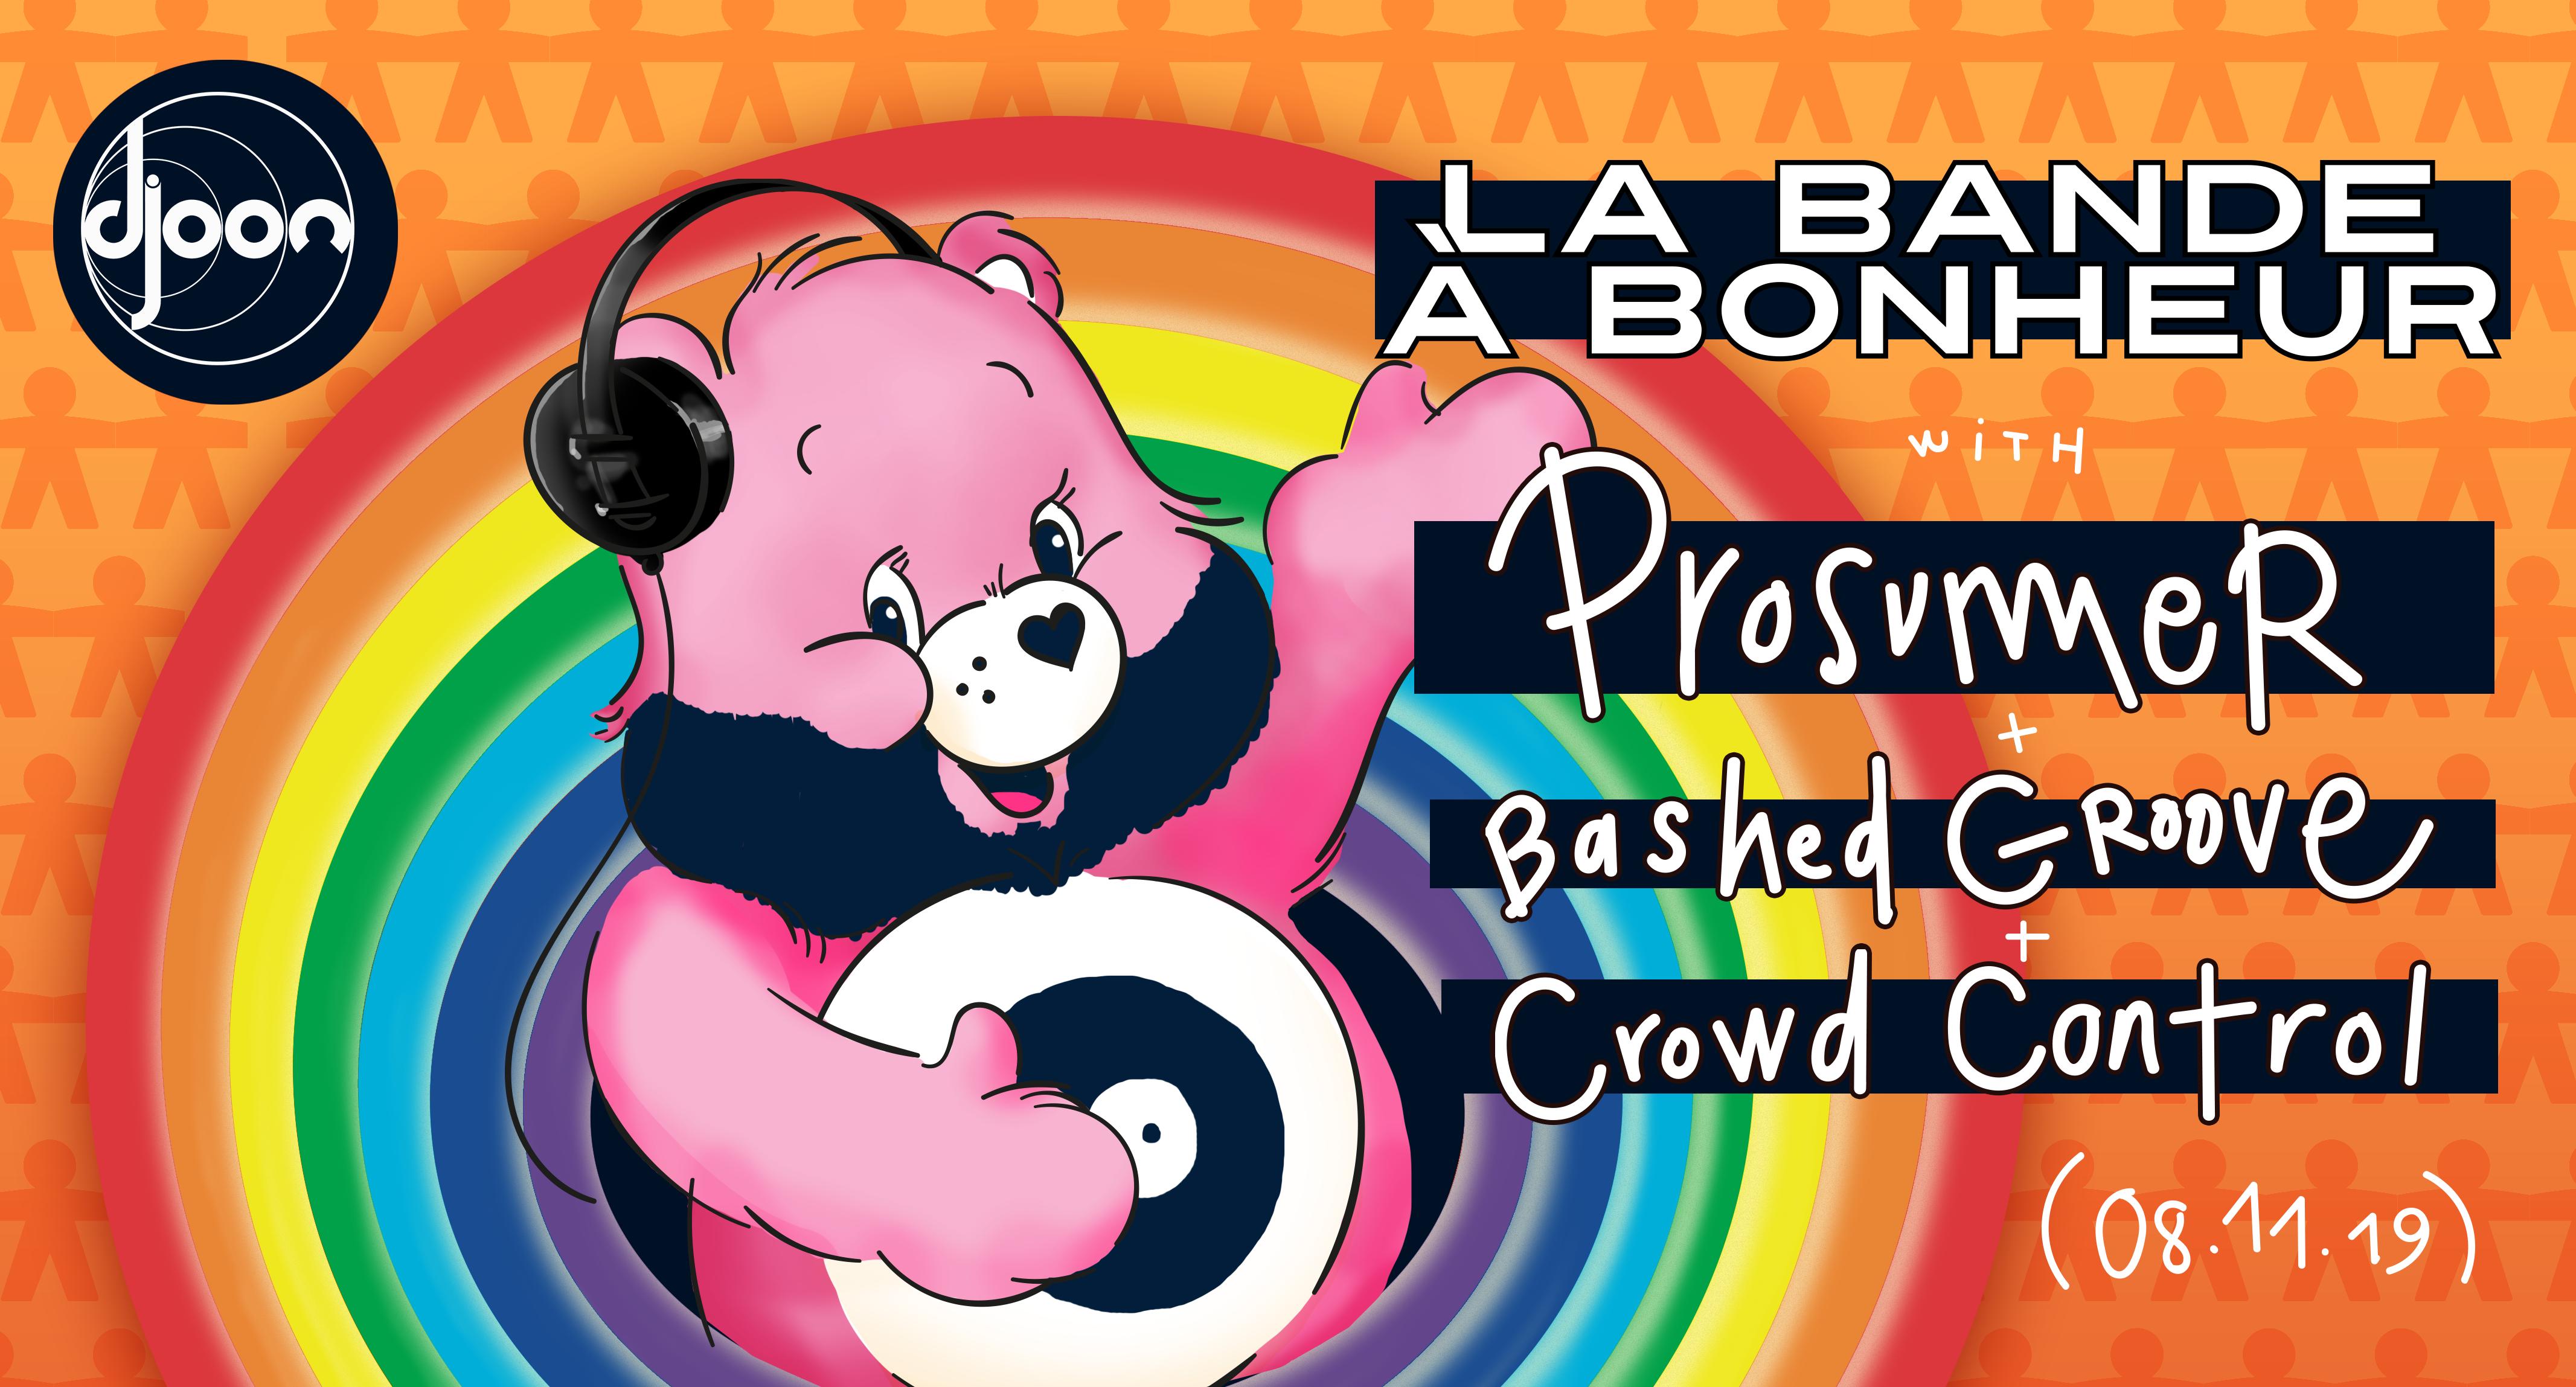 La Bande À Bonheur : Prosumer, Bashed Groove, Crowd Control